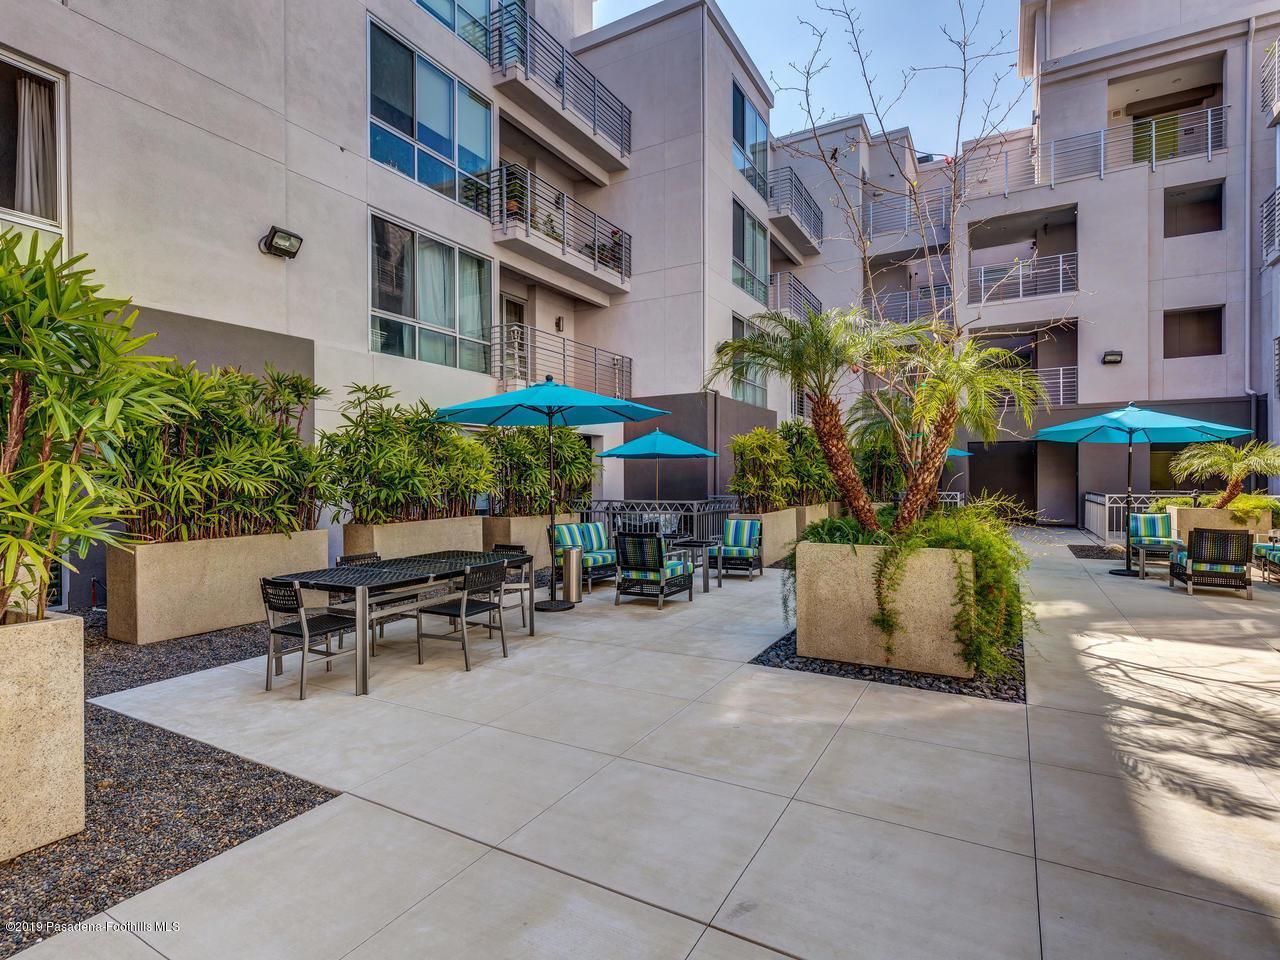 111 DE LACEY, Pasadena, CA 91105 - Courtyard